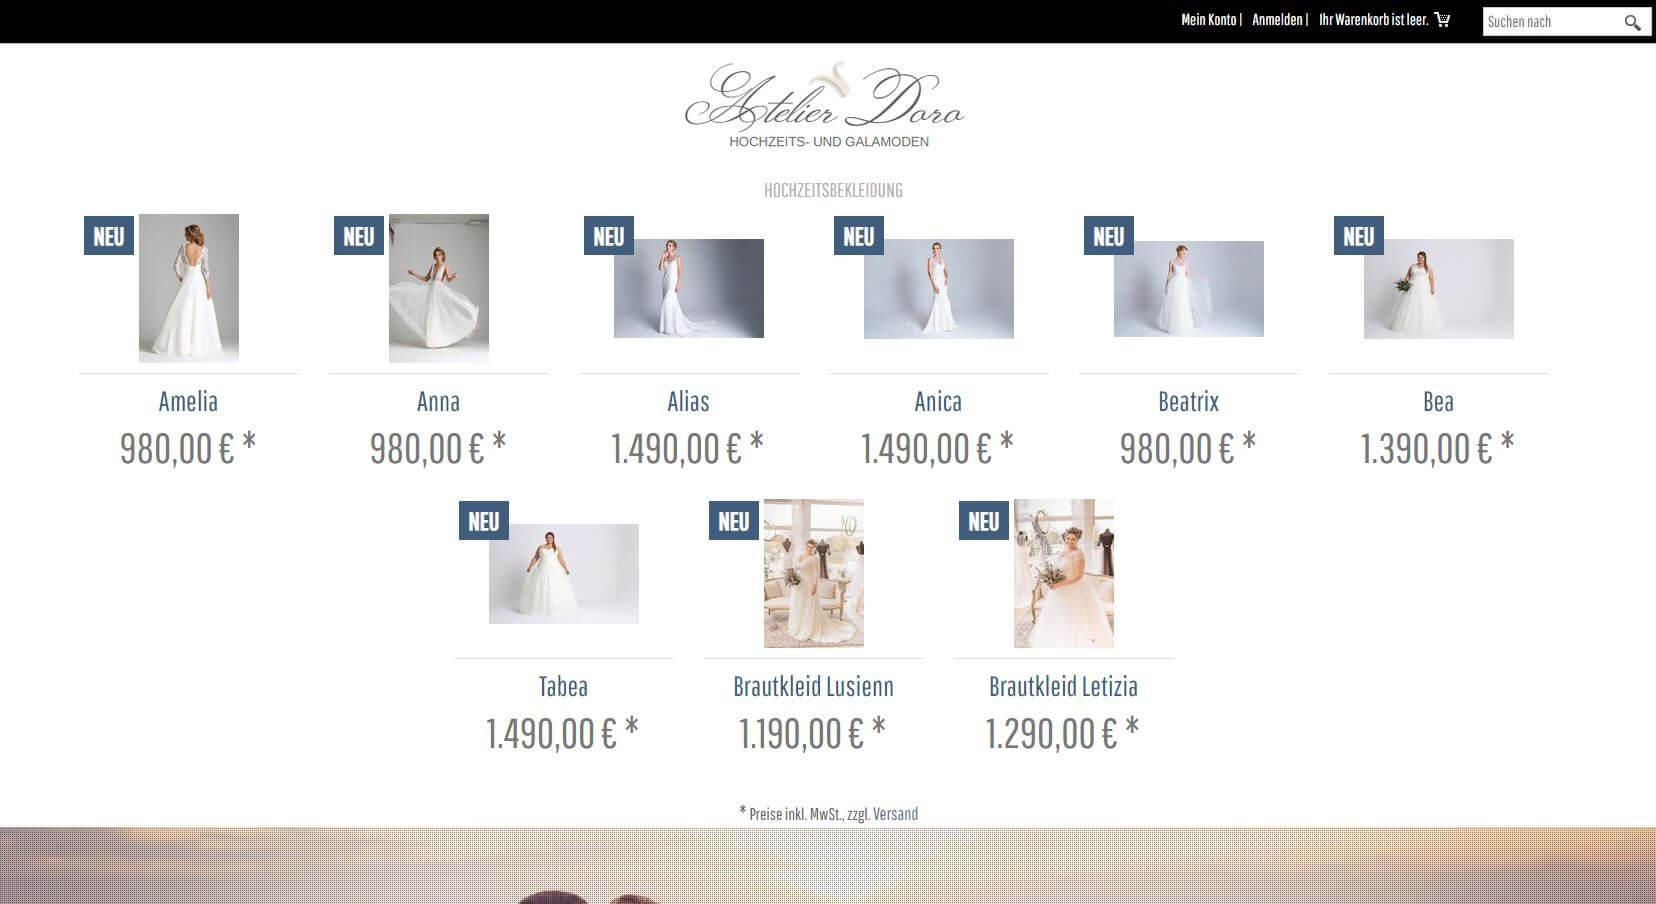 Screenshot Atelier Doro